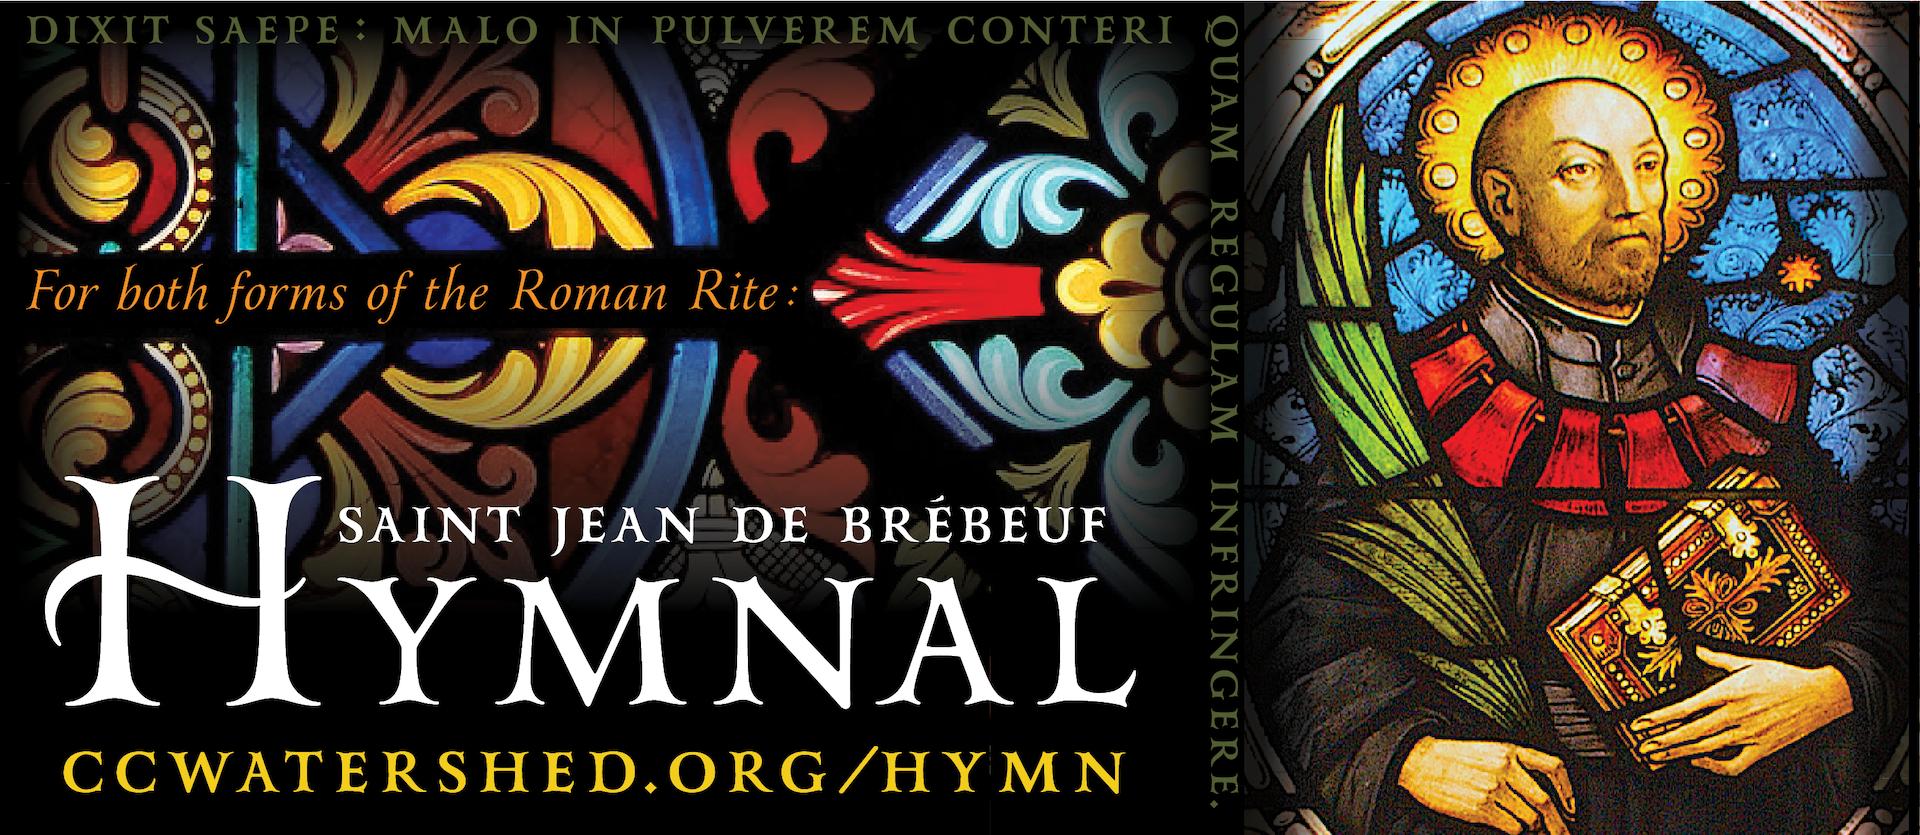 The Saint Jean de Brébeuf Hymnal